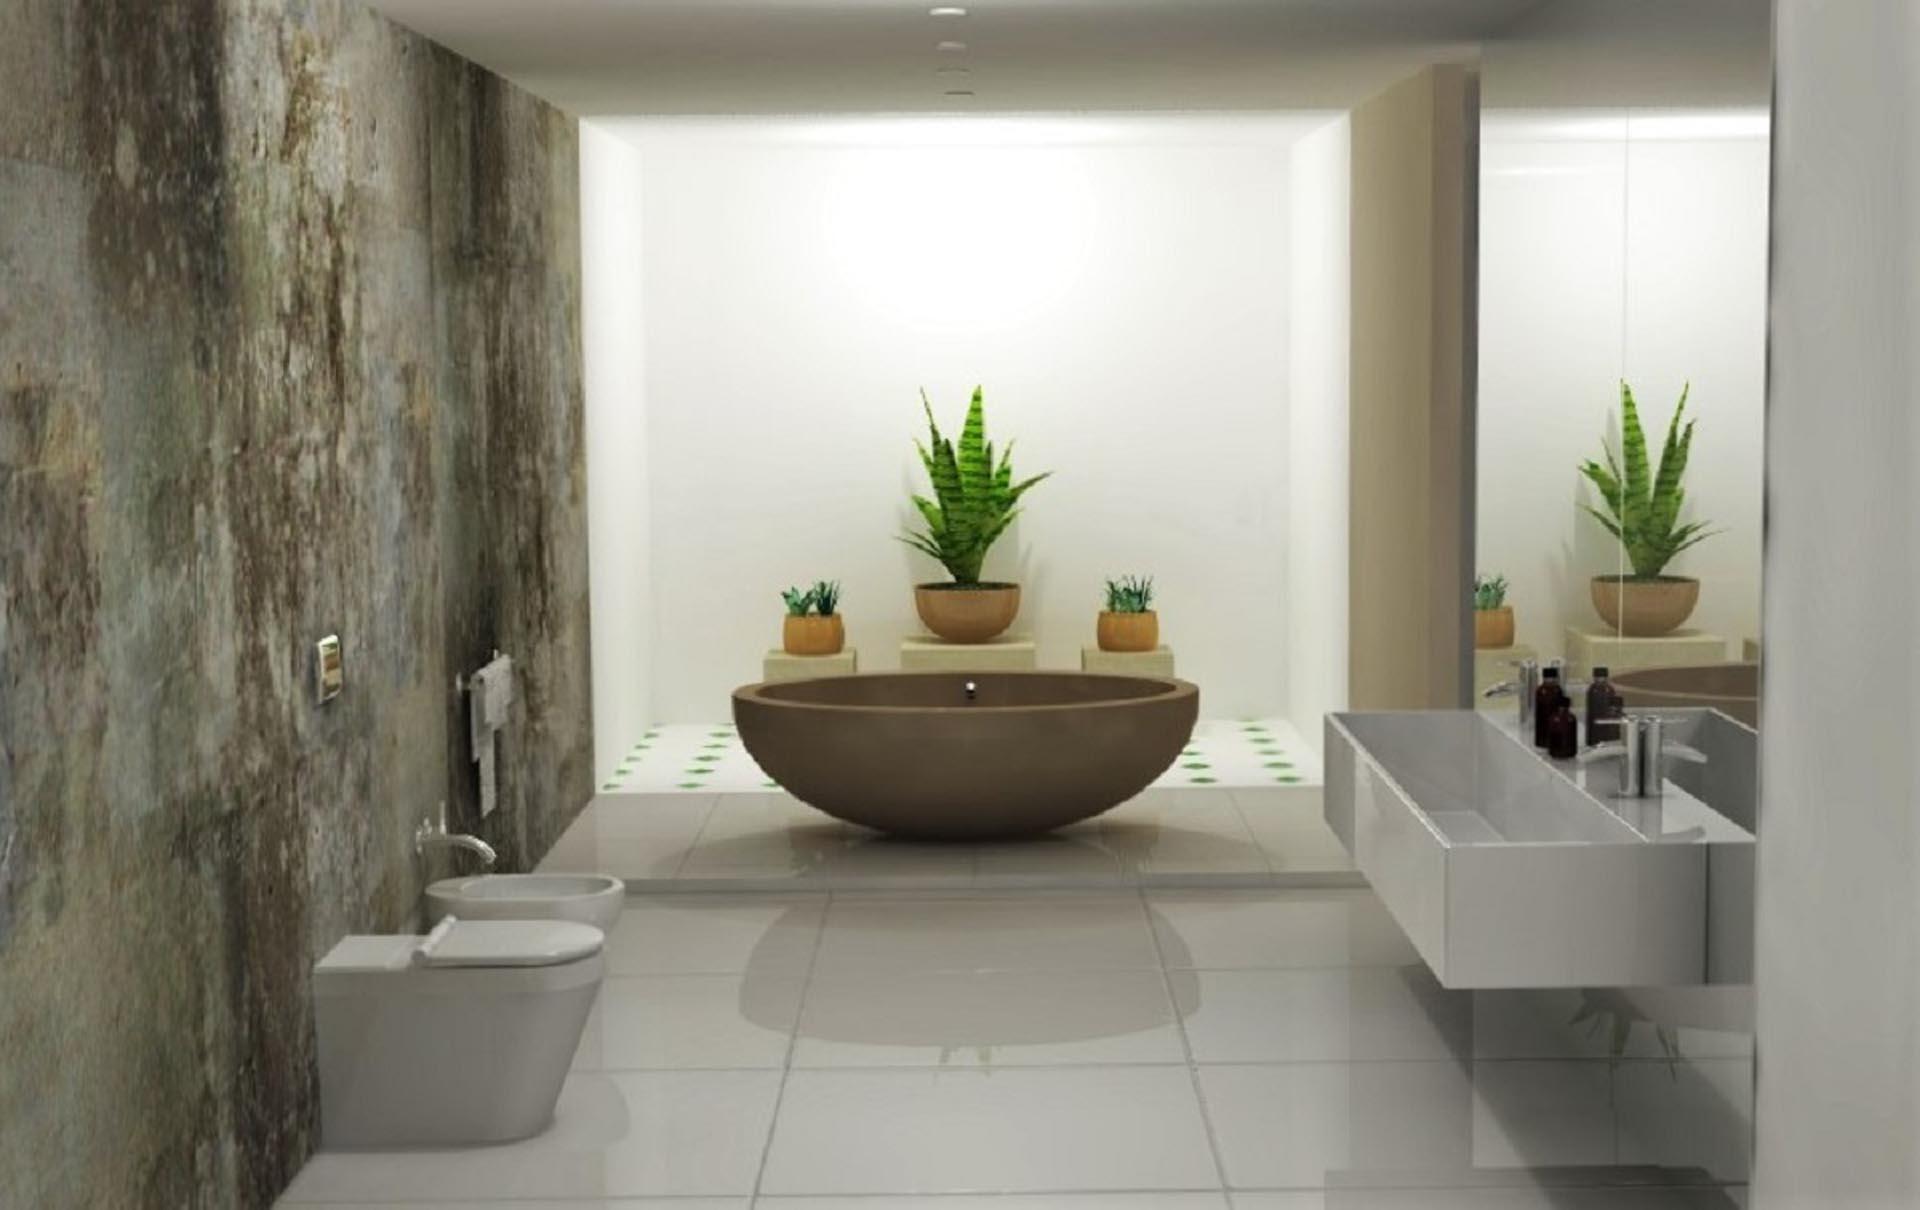 Stone Bathroom by Sketch & Render image